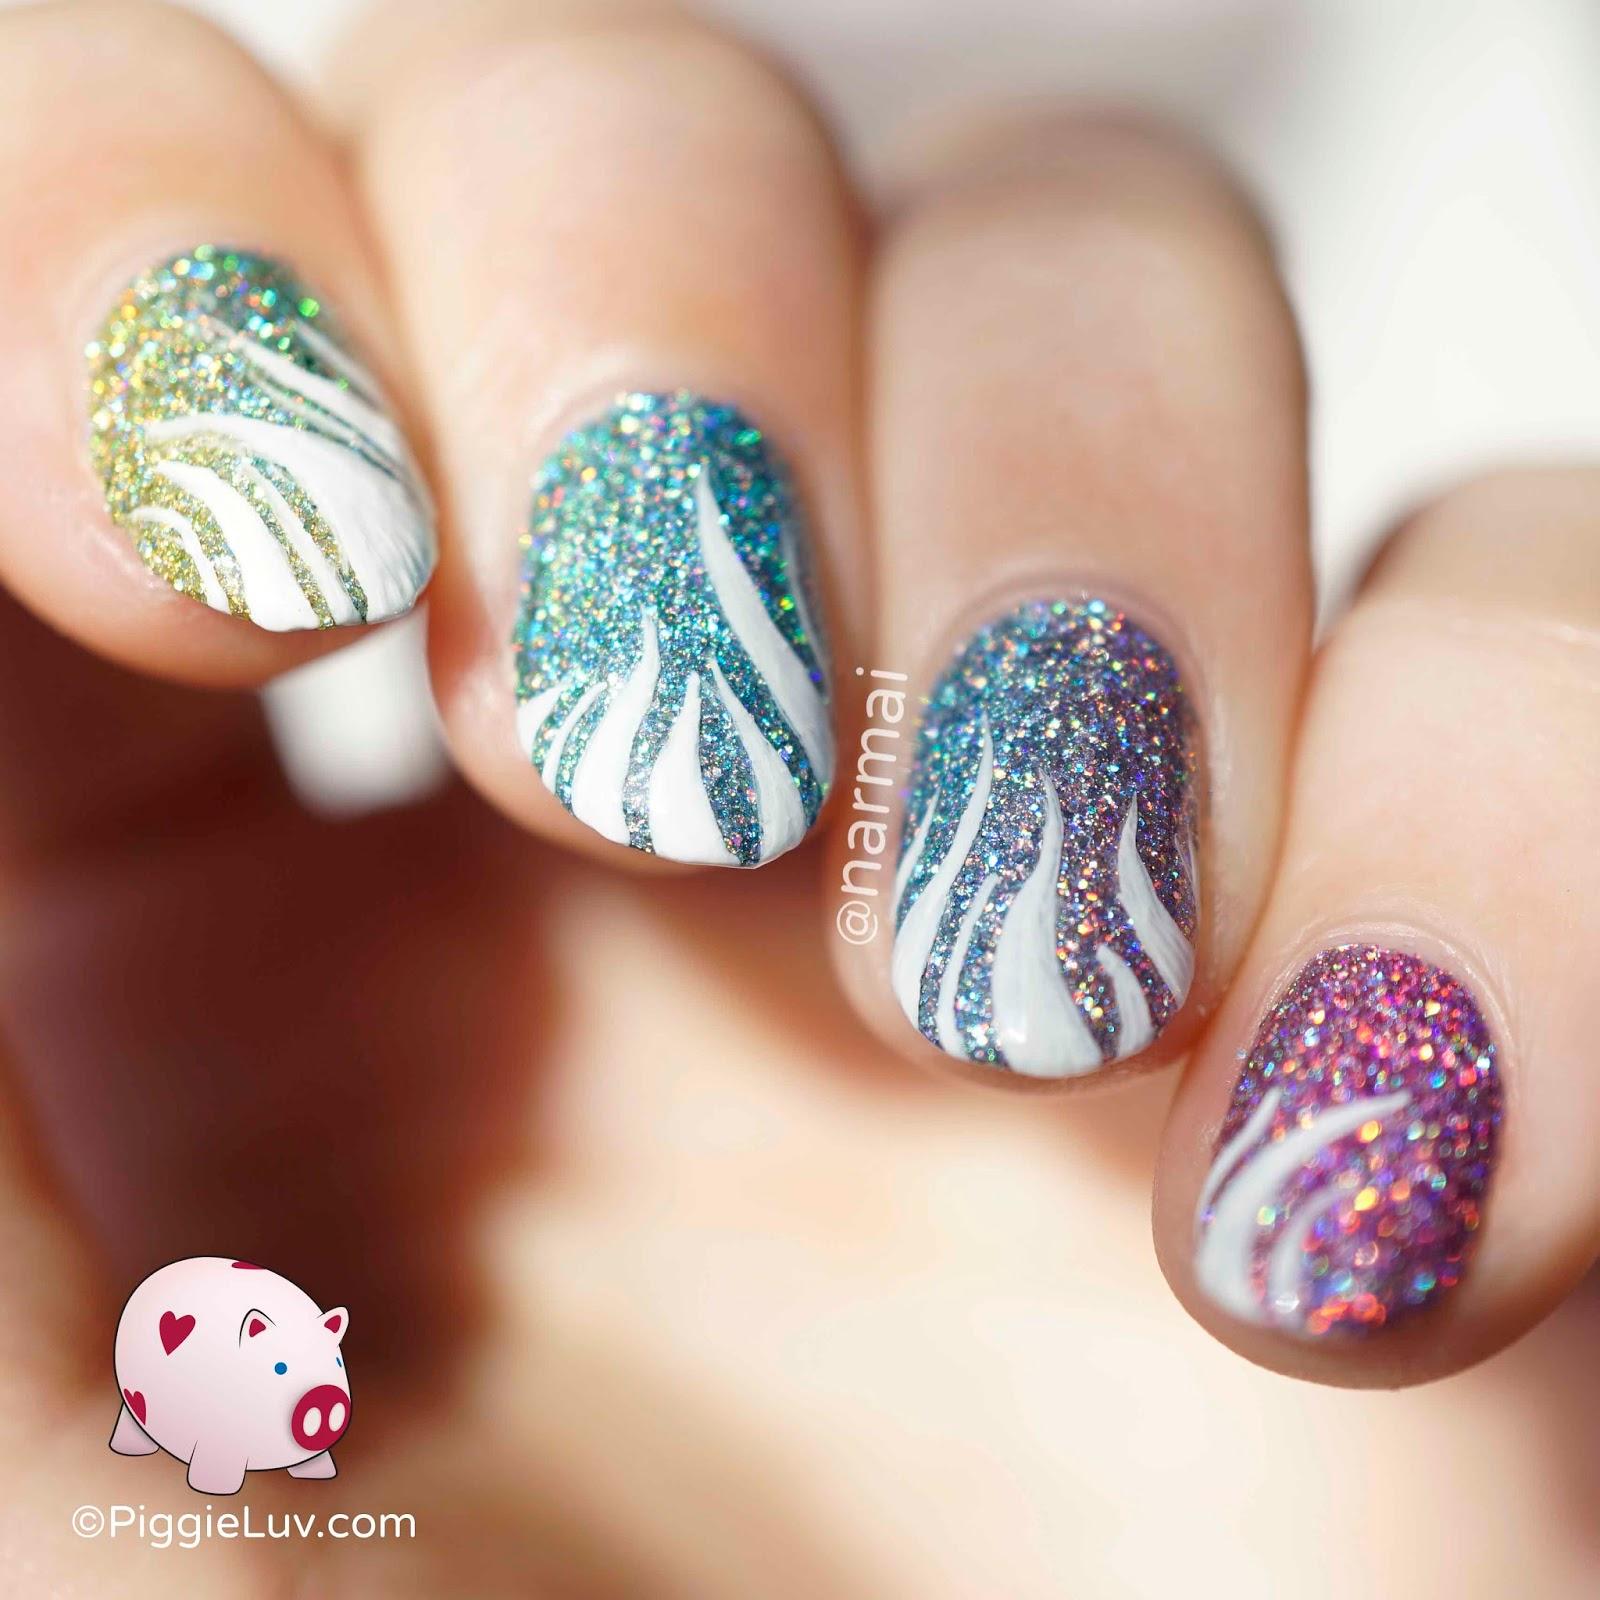 Gradient Nail Art: PiggieLuv: Dynomite Holo Rainbow Gradient Nail Art